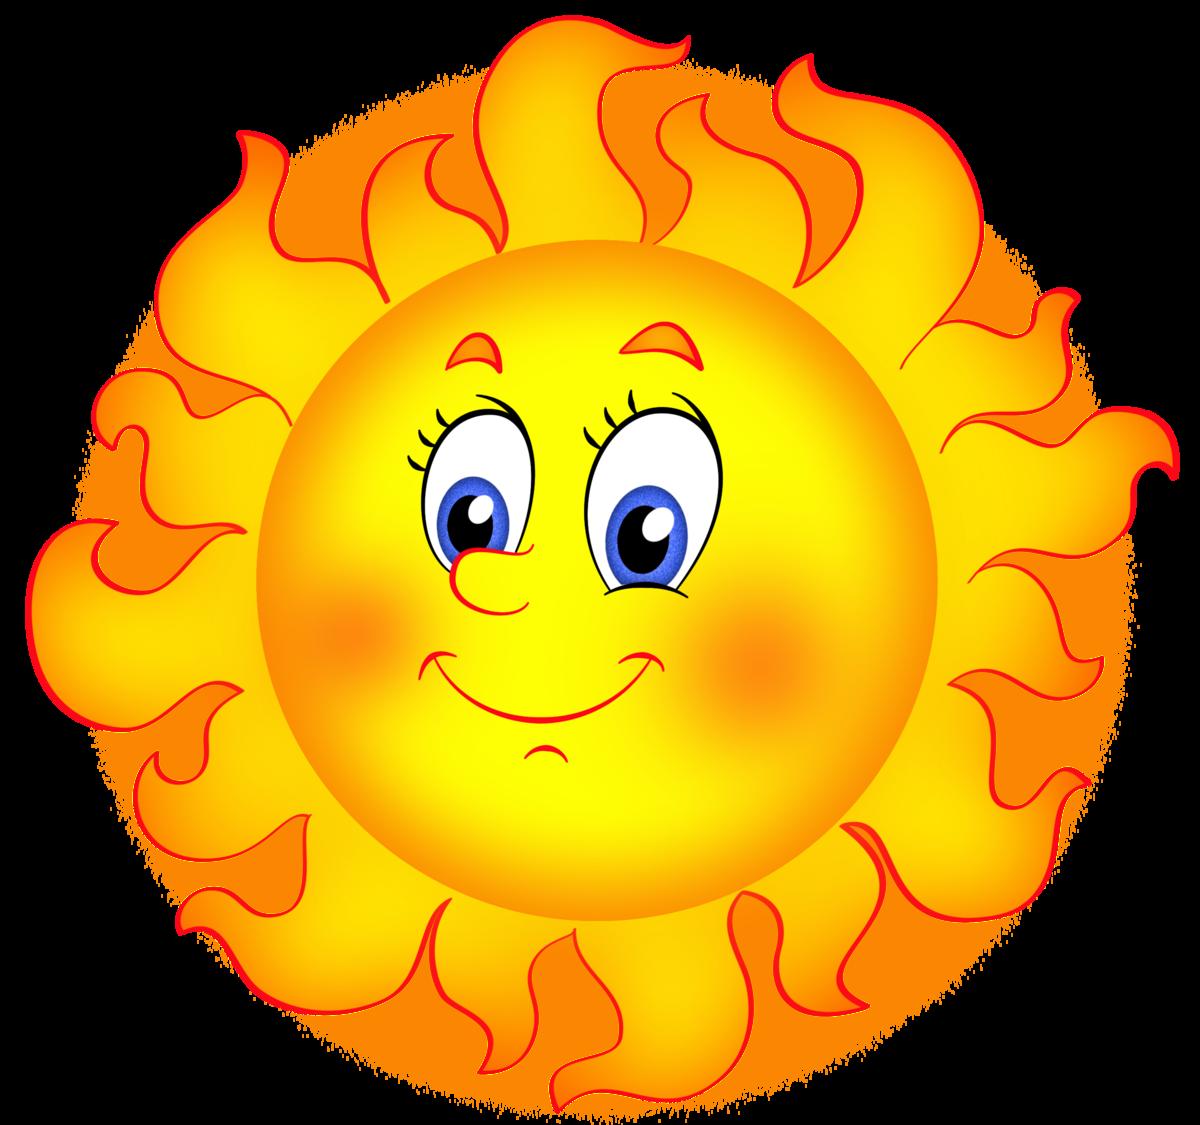 Картинка веселого солнца